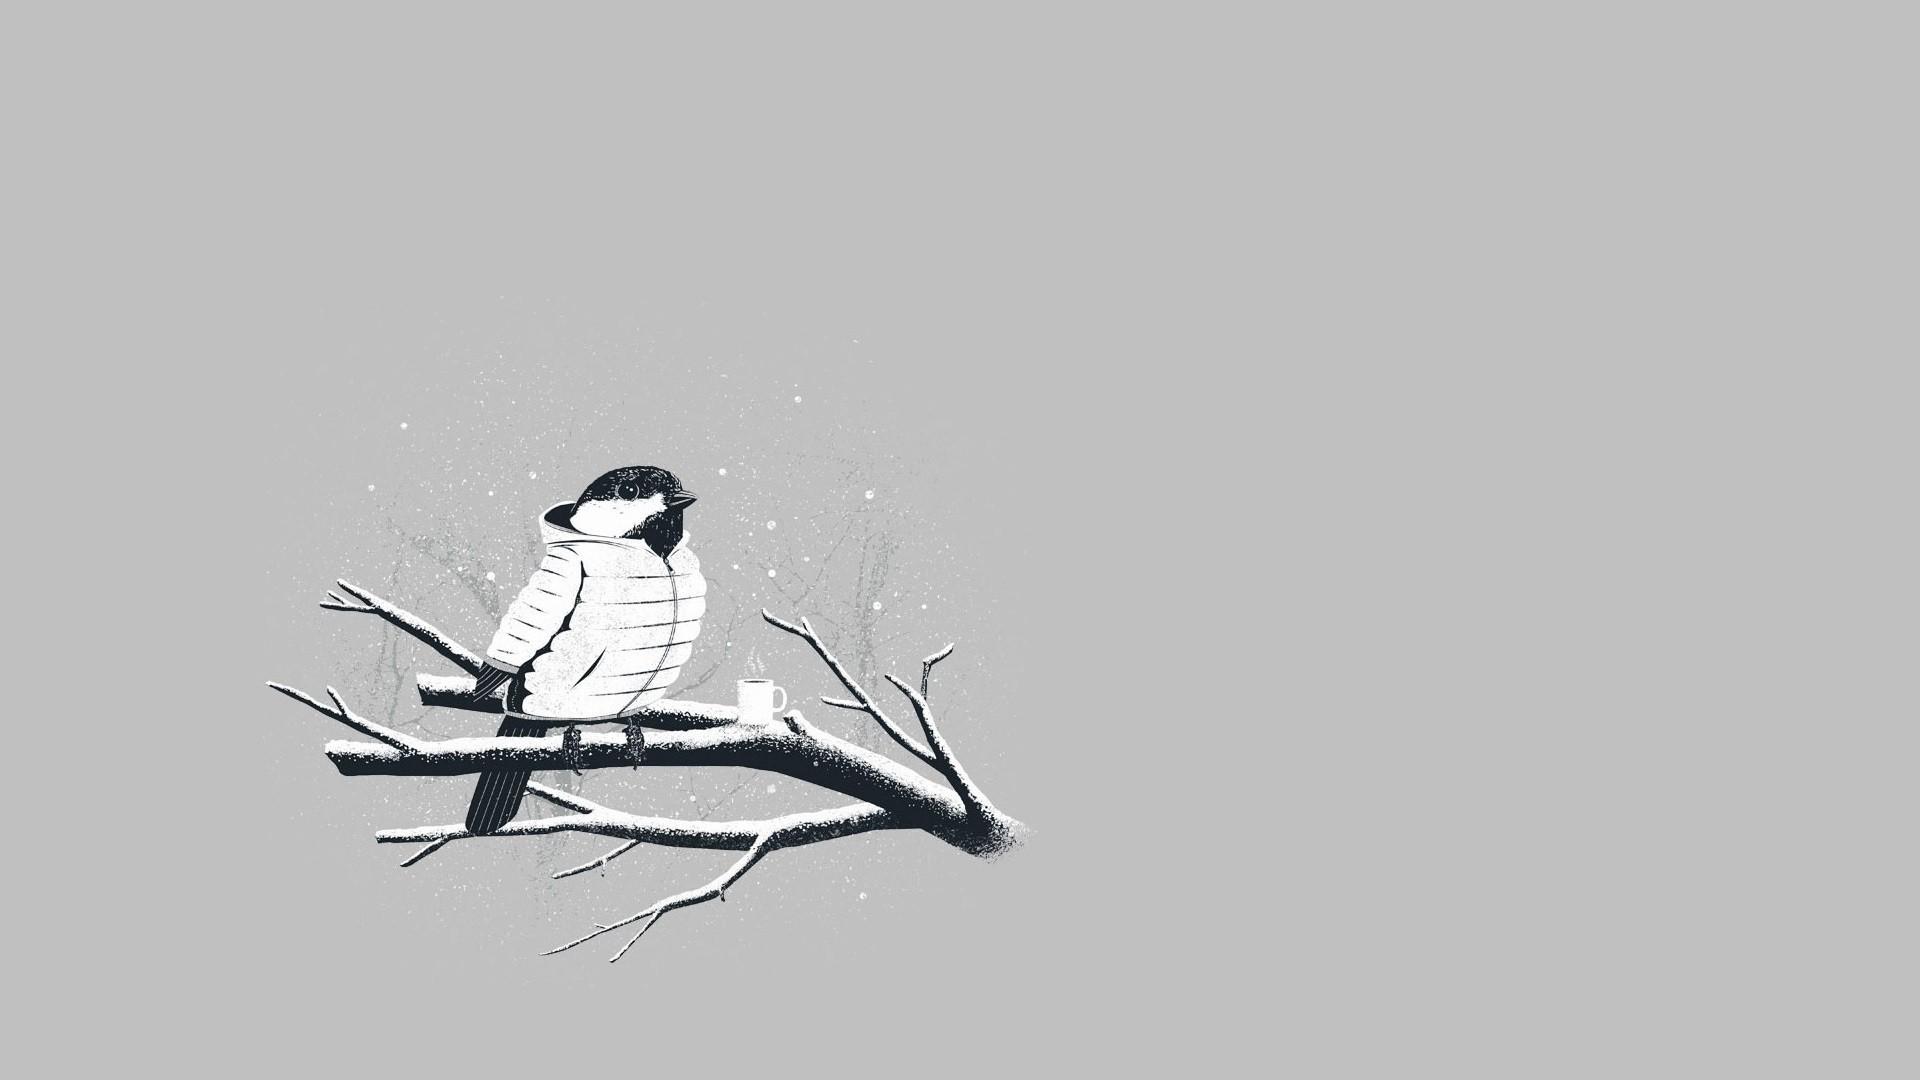 Beautiful Wallpaper Bird Minimalist - drawing-illustration-birds-minimalism-jacket-bird-wing-sketch-1920x1080-px-perching-bird-529885  Pictures_994170.jpg